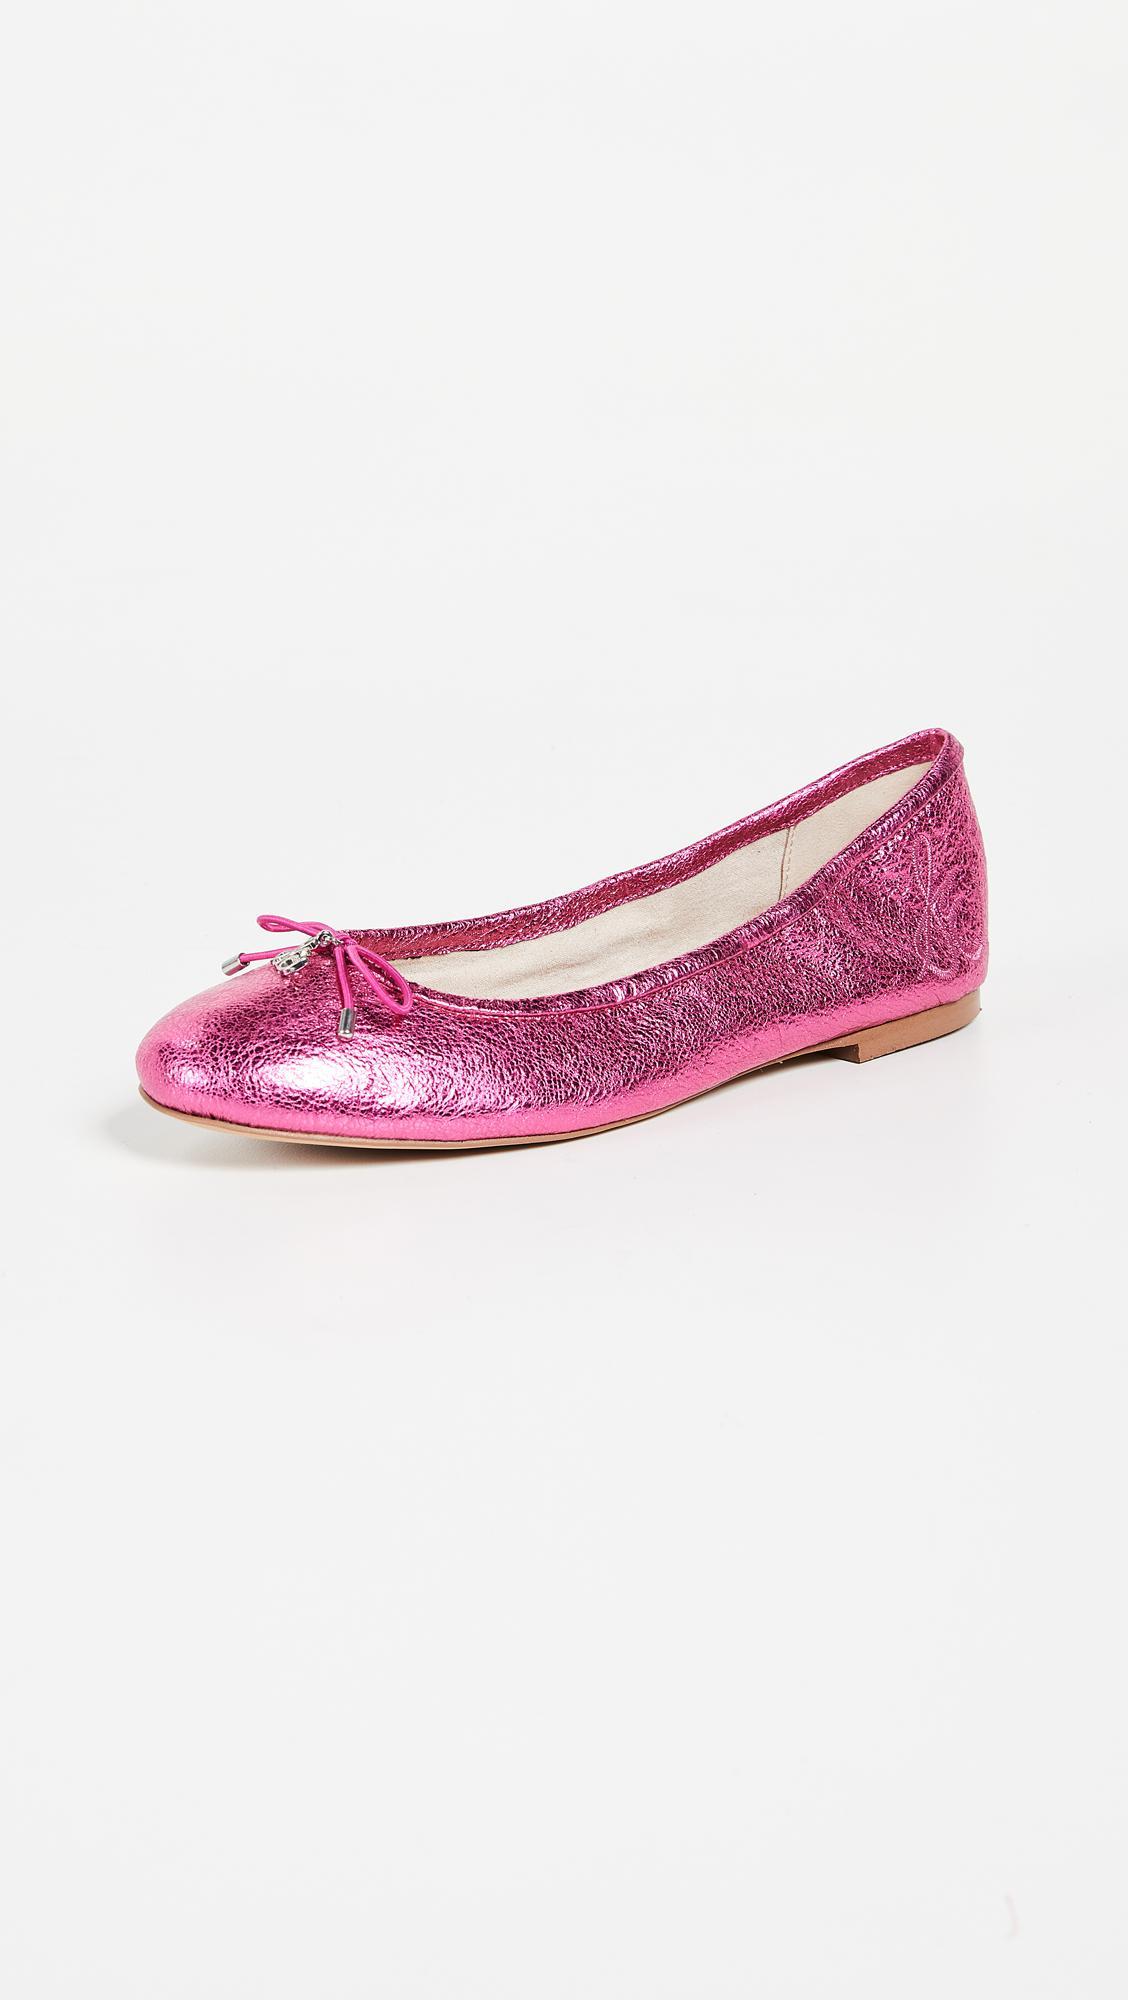 aa2e898b66127 Lyst - Sam Edelman Felicia Ballet Flats in Pink